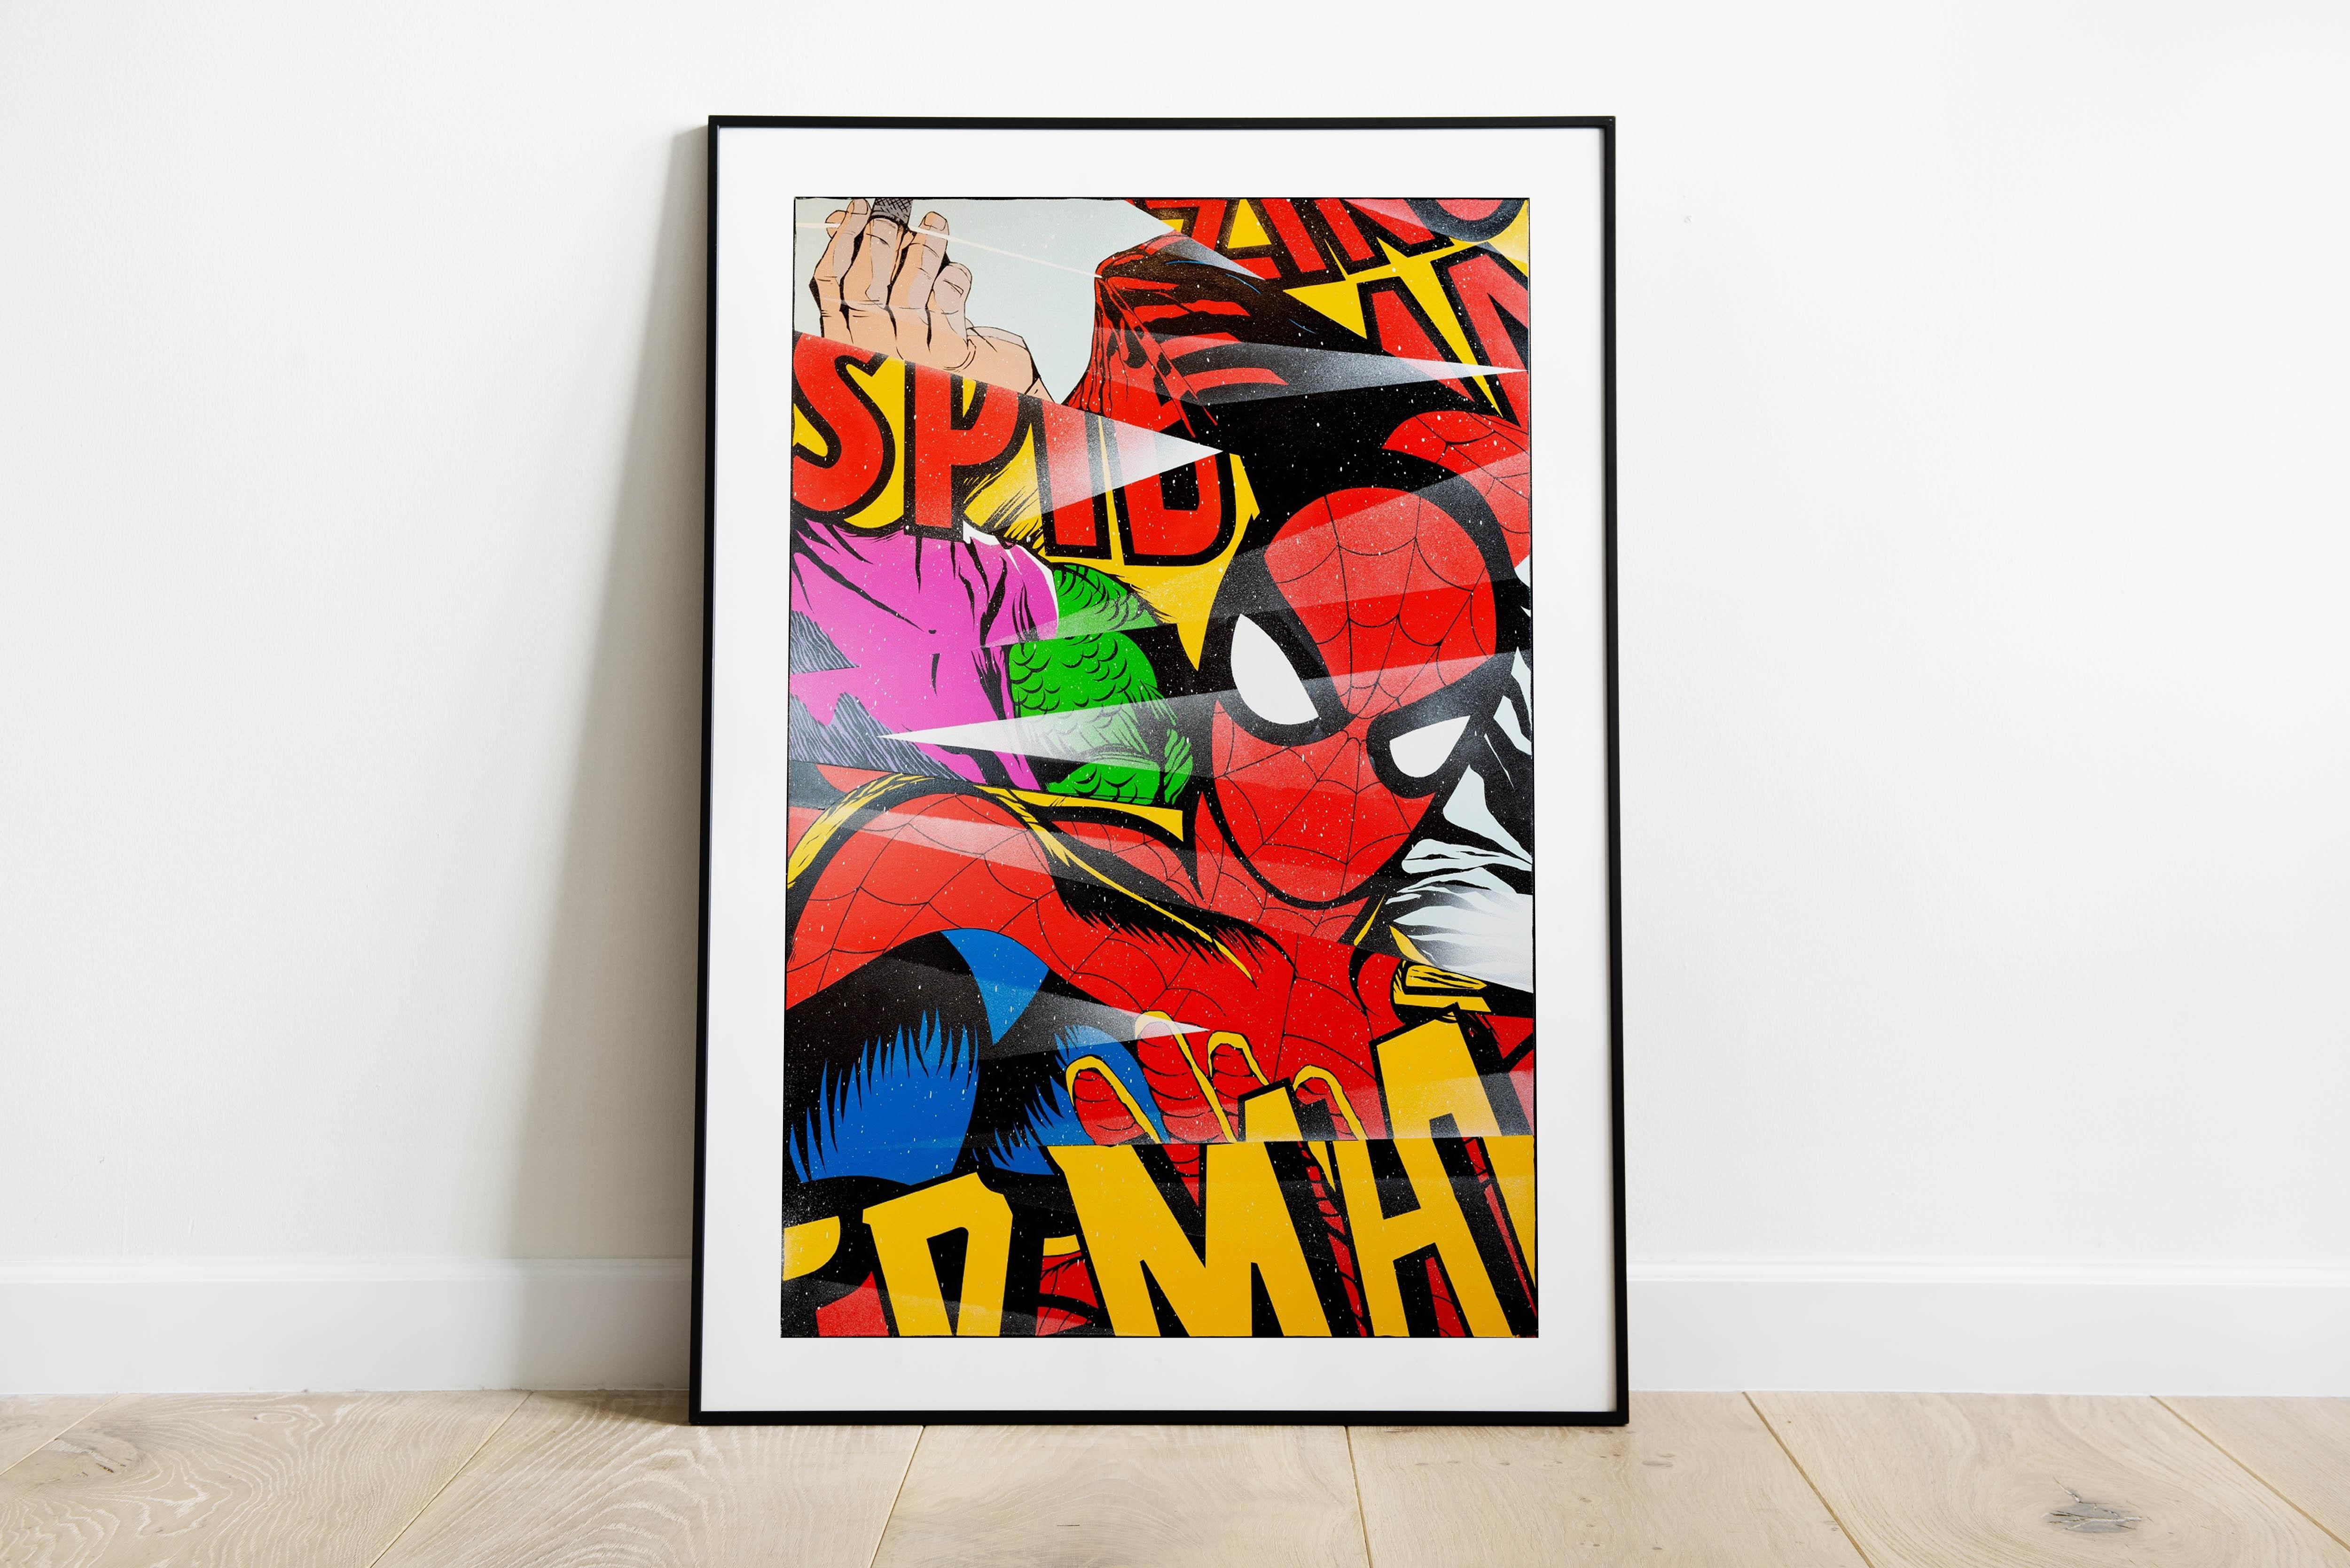 Spiderman Print In Situ